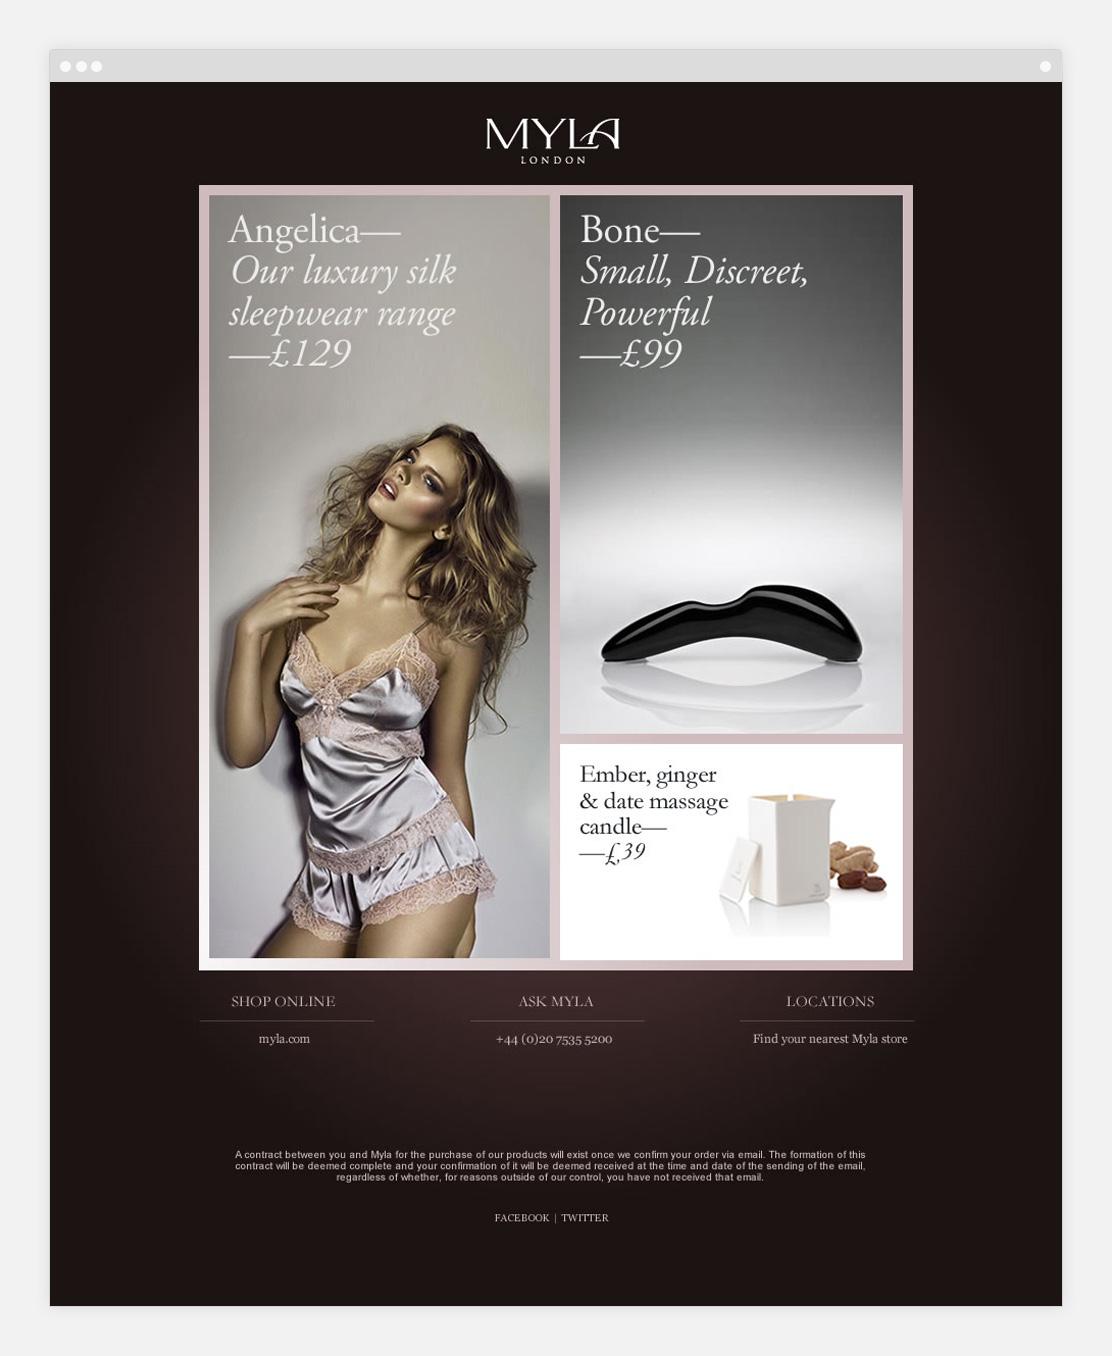 Myla website